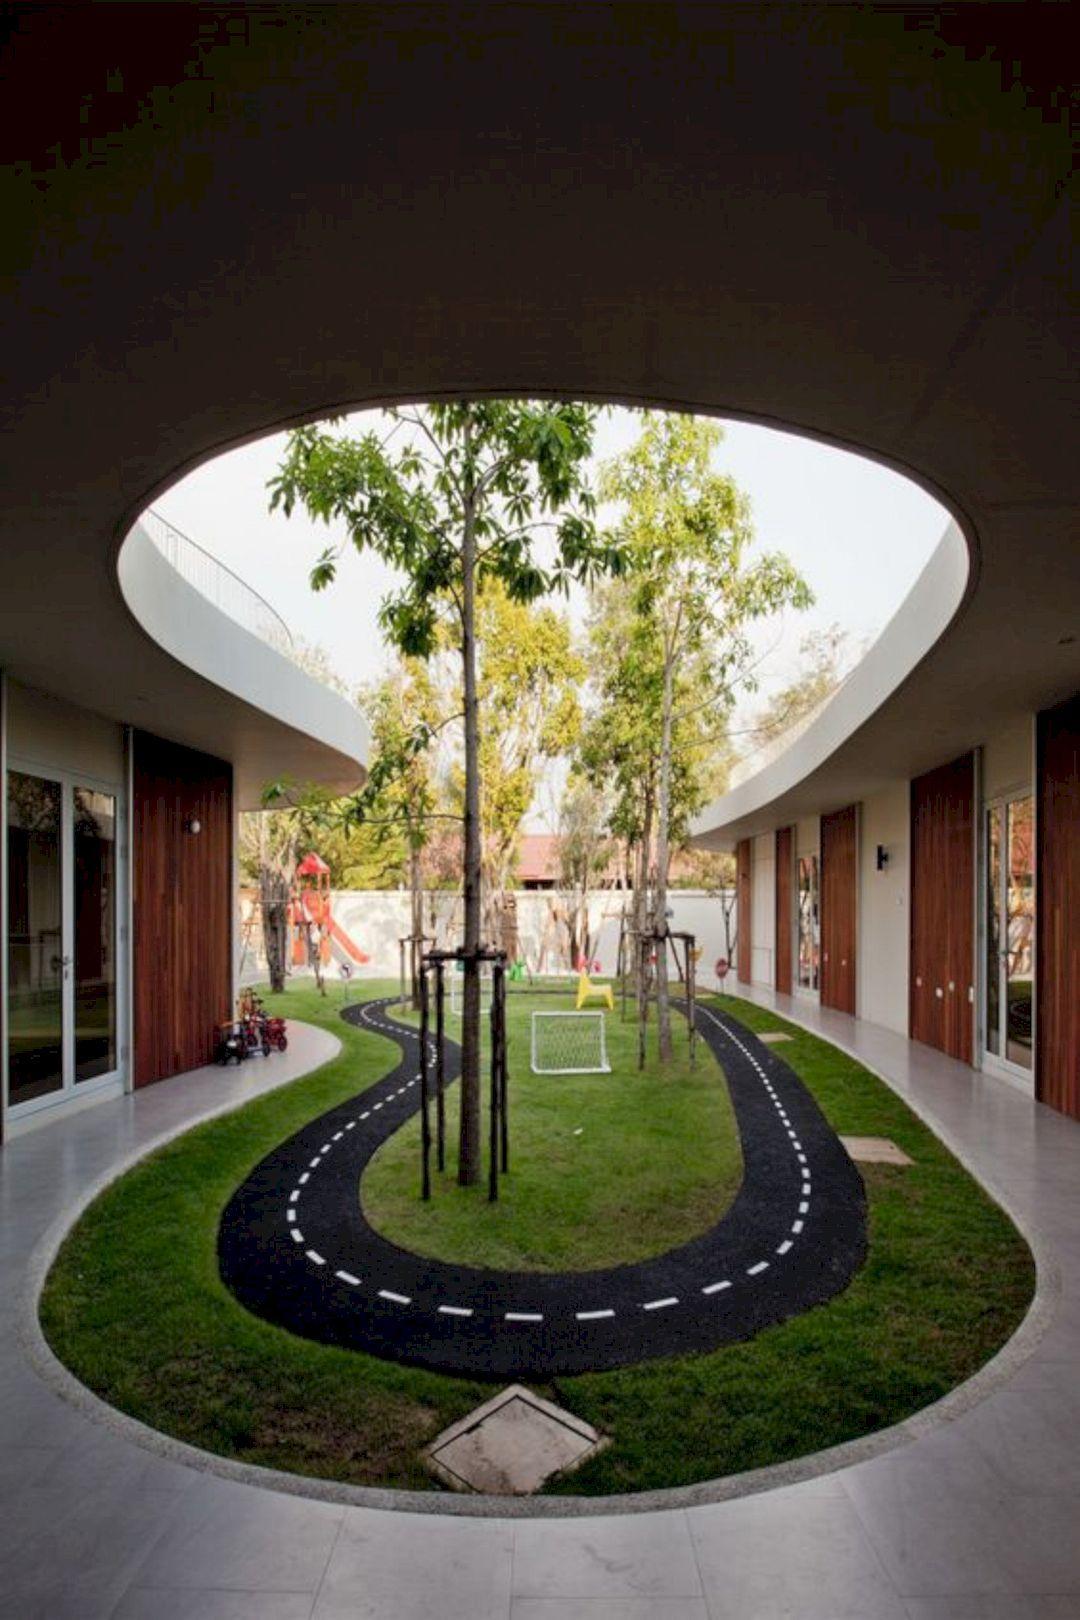 16 Play School Interior Design Ideas | Interiors, Modern interiors ...